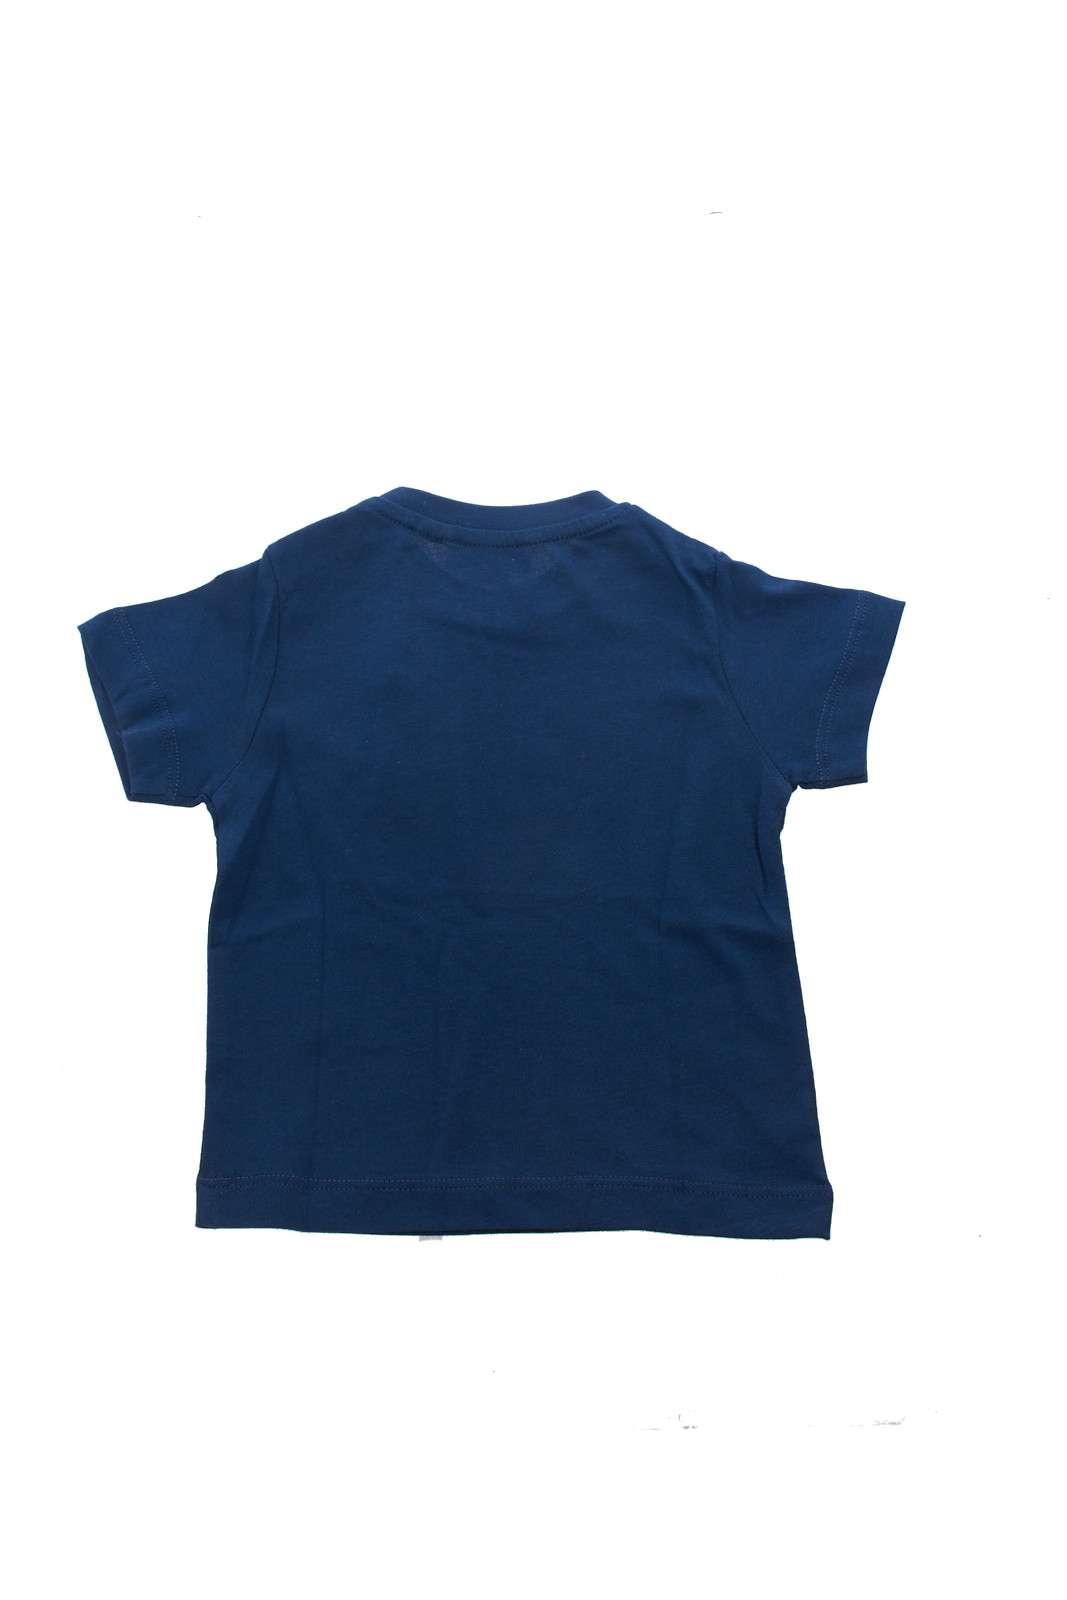 https://www.parmax.com/media/catalog/product/a/i/PE-outlet_parmax-t-shirt-bambino-Us-Polo-51202-B.jpg